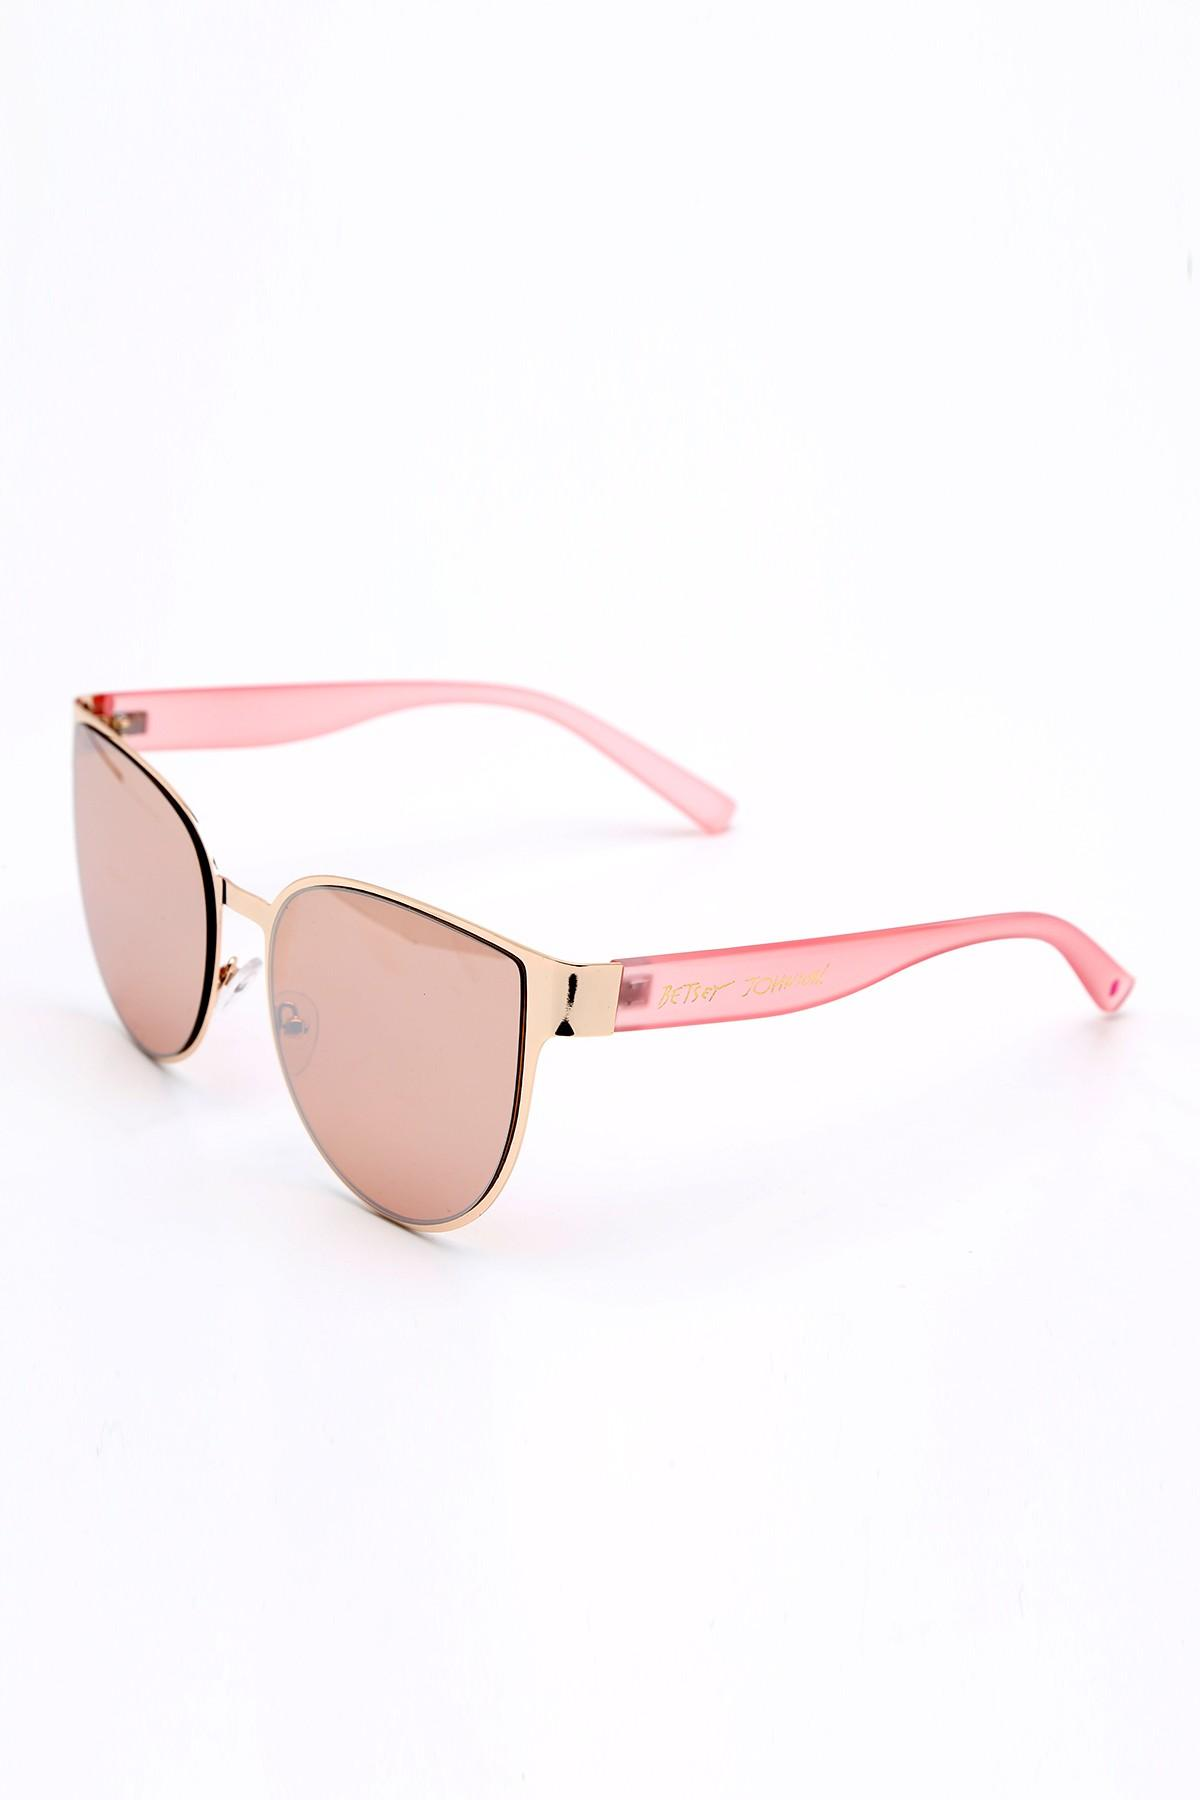 34298c02d6f33 Betsey Johnson - Pink 55mm Cat Eye Sunglasses - Lyst. View fullscreen